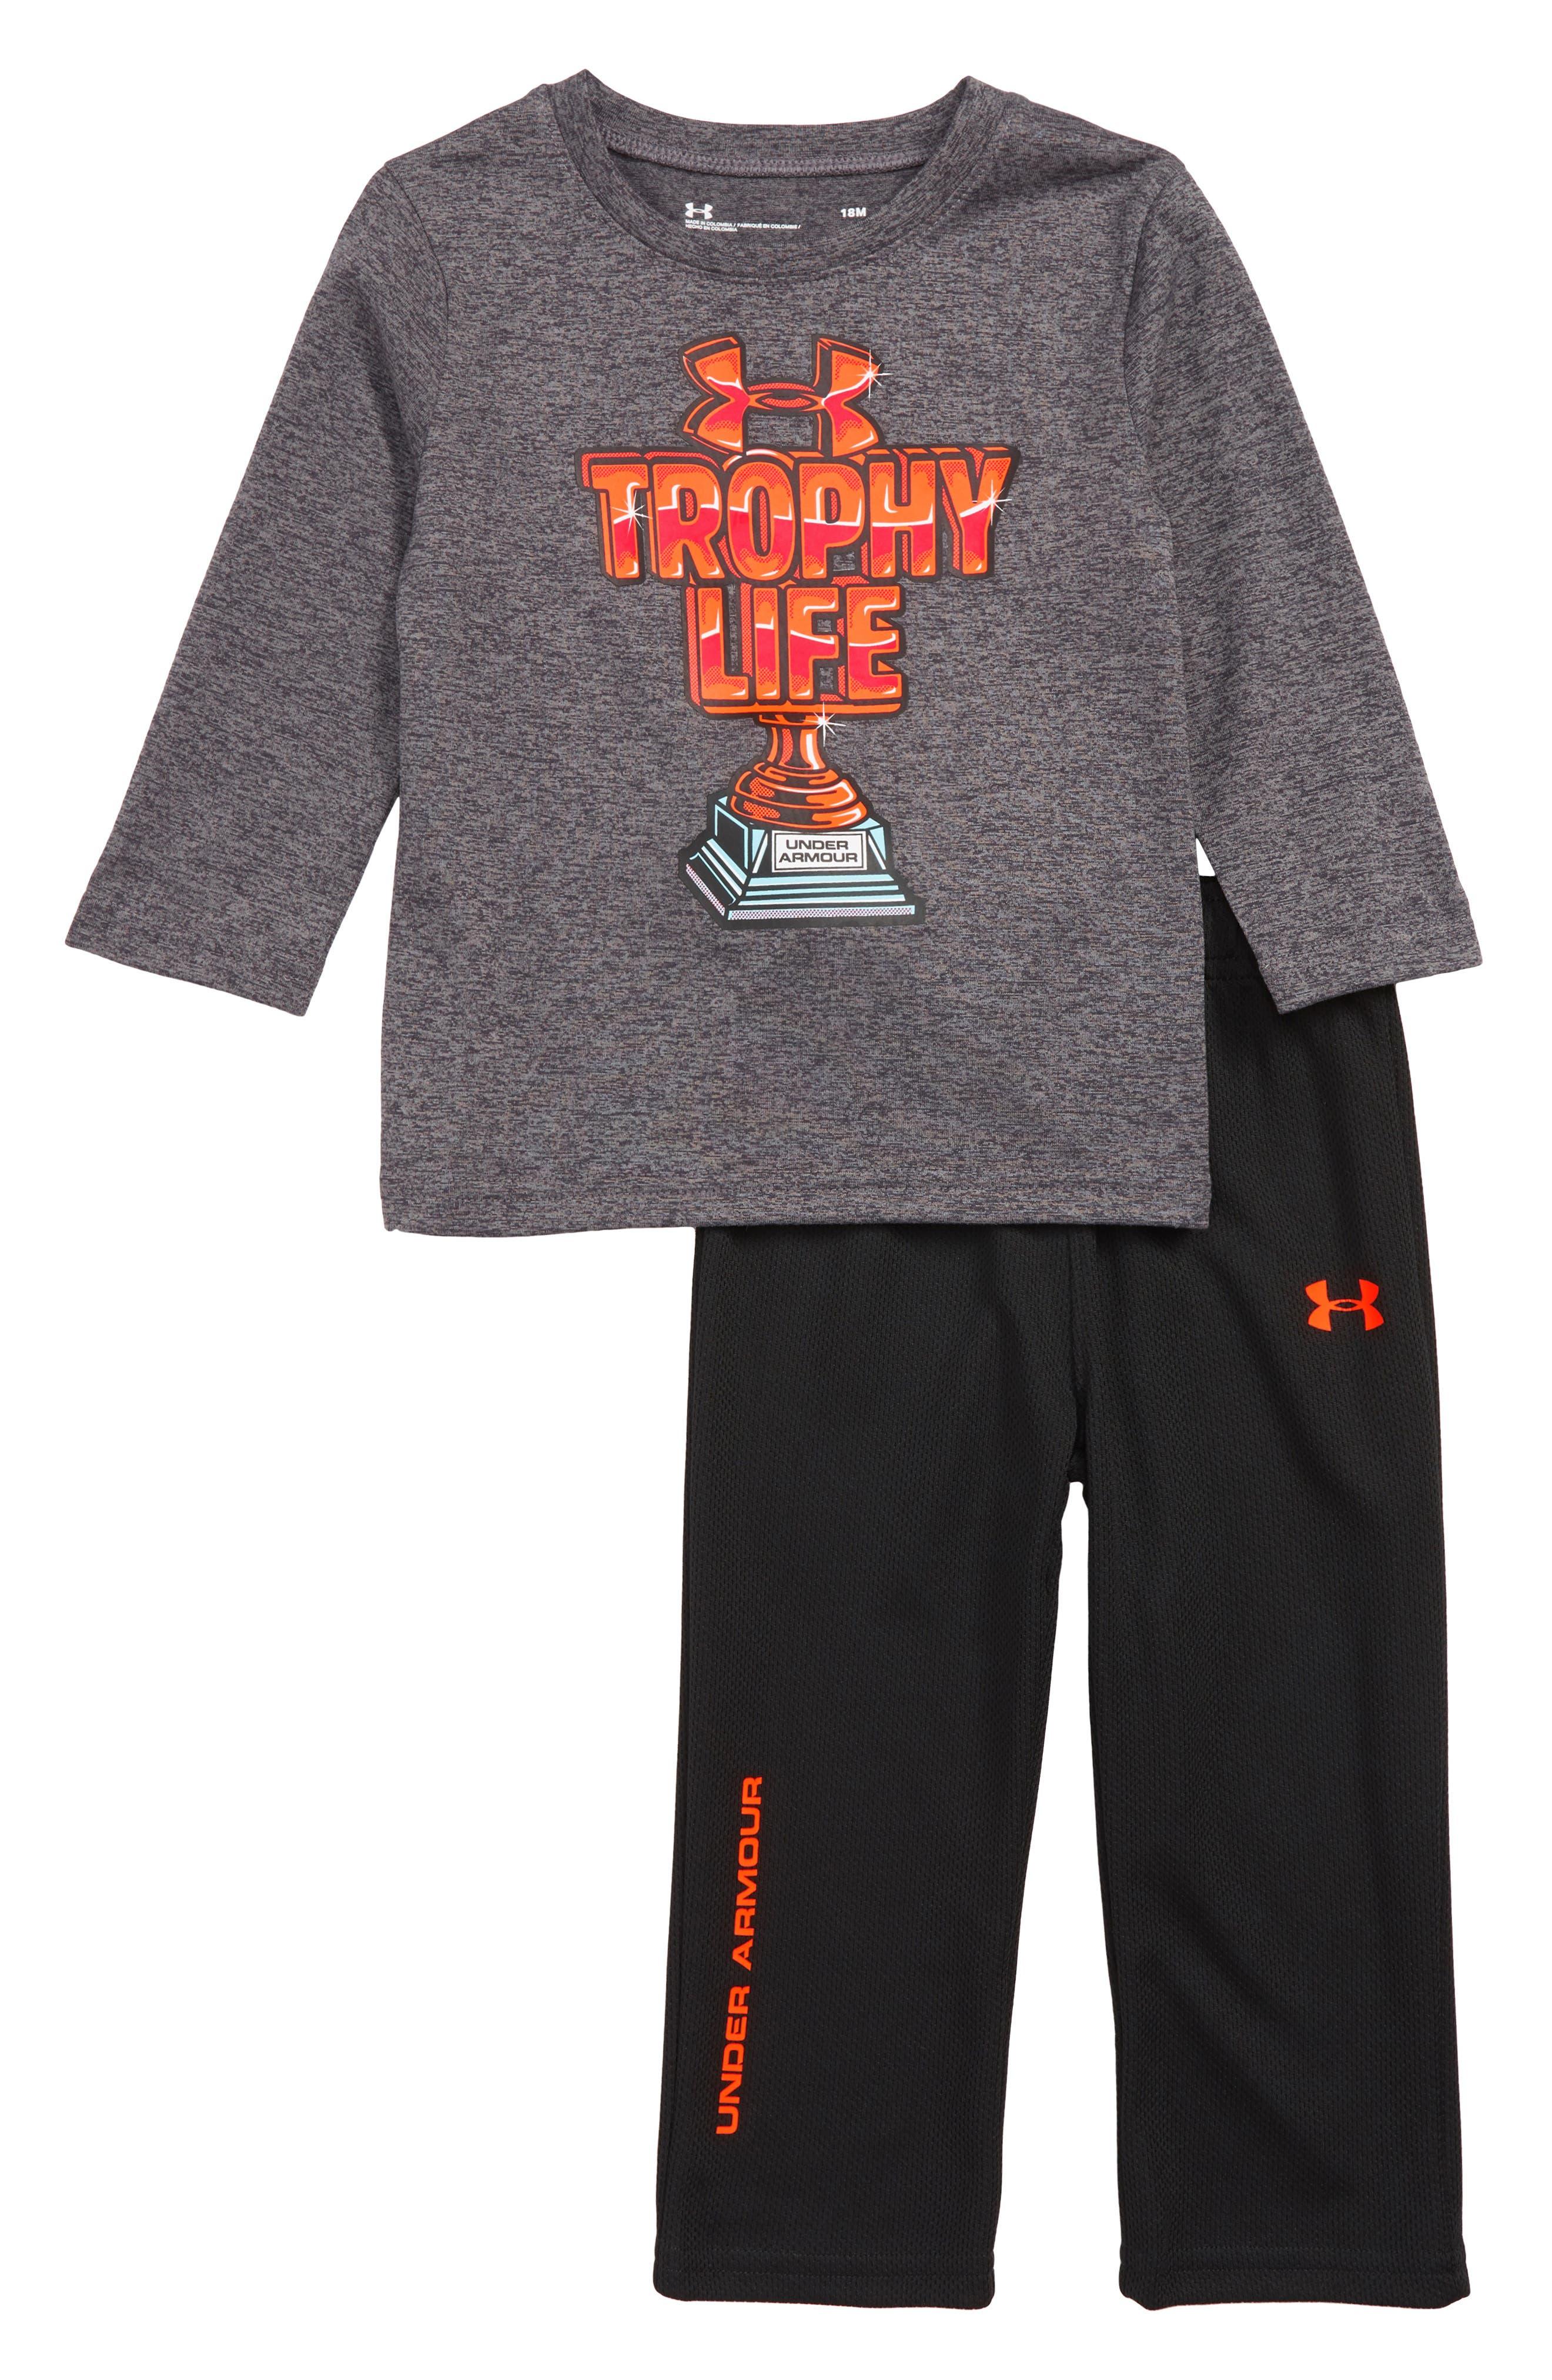 Trophy T-Shirt and Pants Set,                             Main thumbnail 1, color,                             023